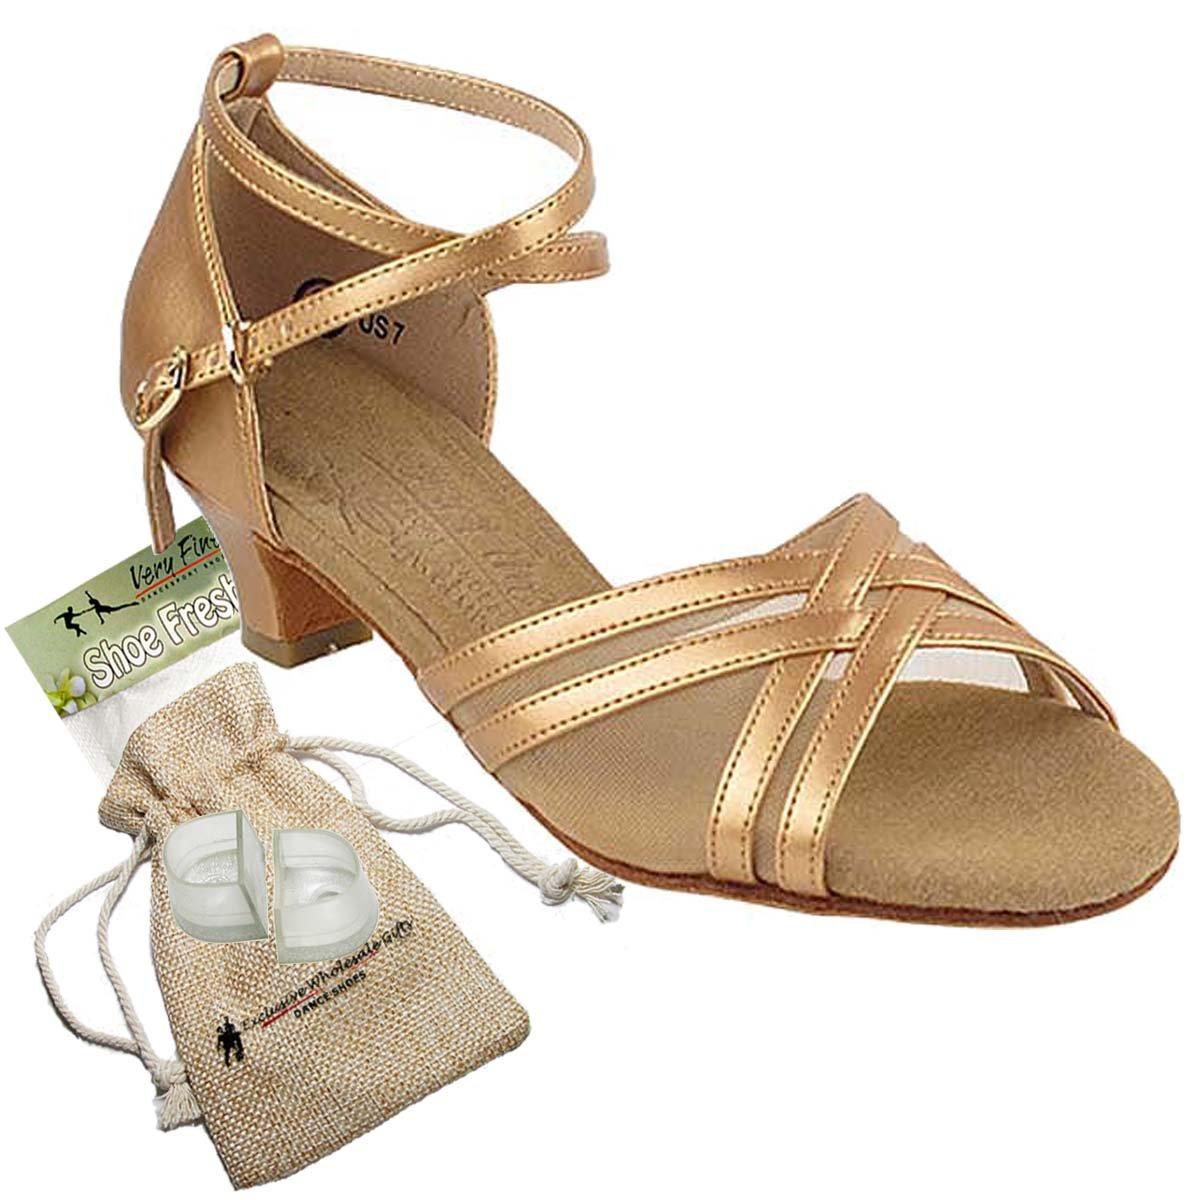 Women's Ballroom Dance Shoes Salsa Latin Practice Dance Shoes Copper Nude Leather S9204EB Comfortable - Very Fine 1.2'' Heel 6.5 M US [Bundle 5]